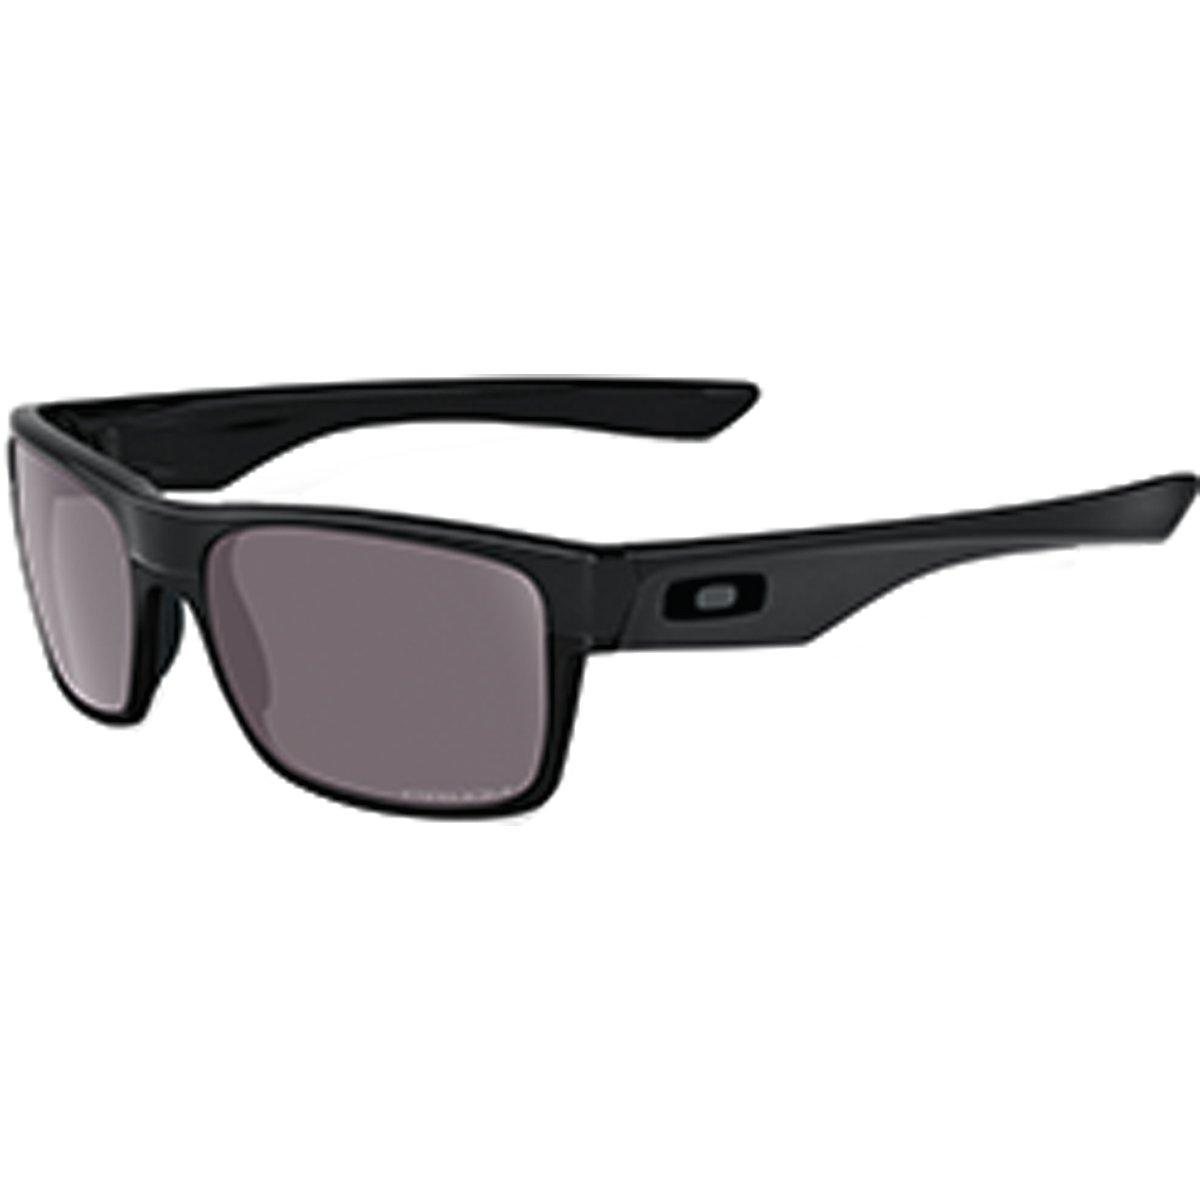 Oakley Men's OO9189 TwoFace Square Sunglasses, Matte Black/Prizm Daily Polarized, 60 mm by Oakley